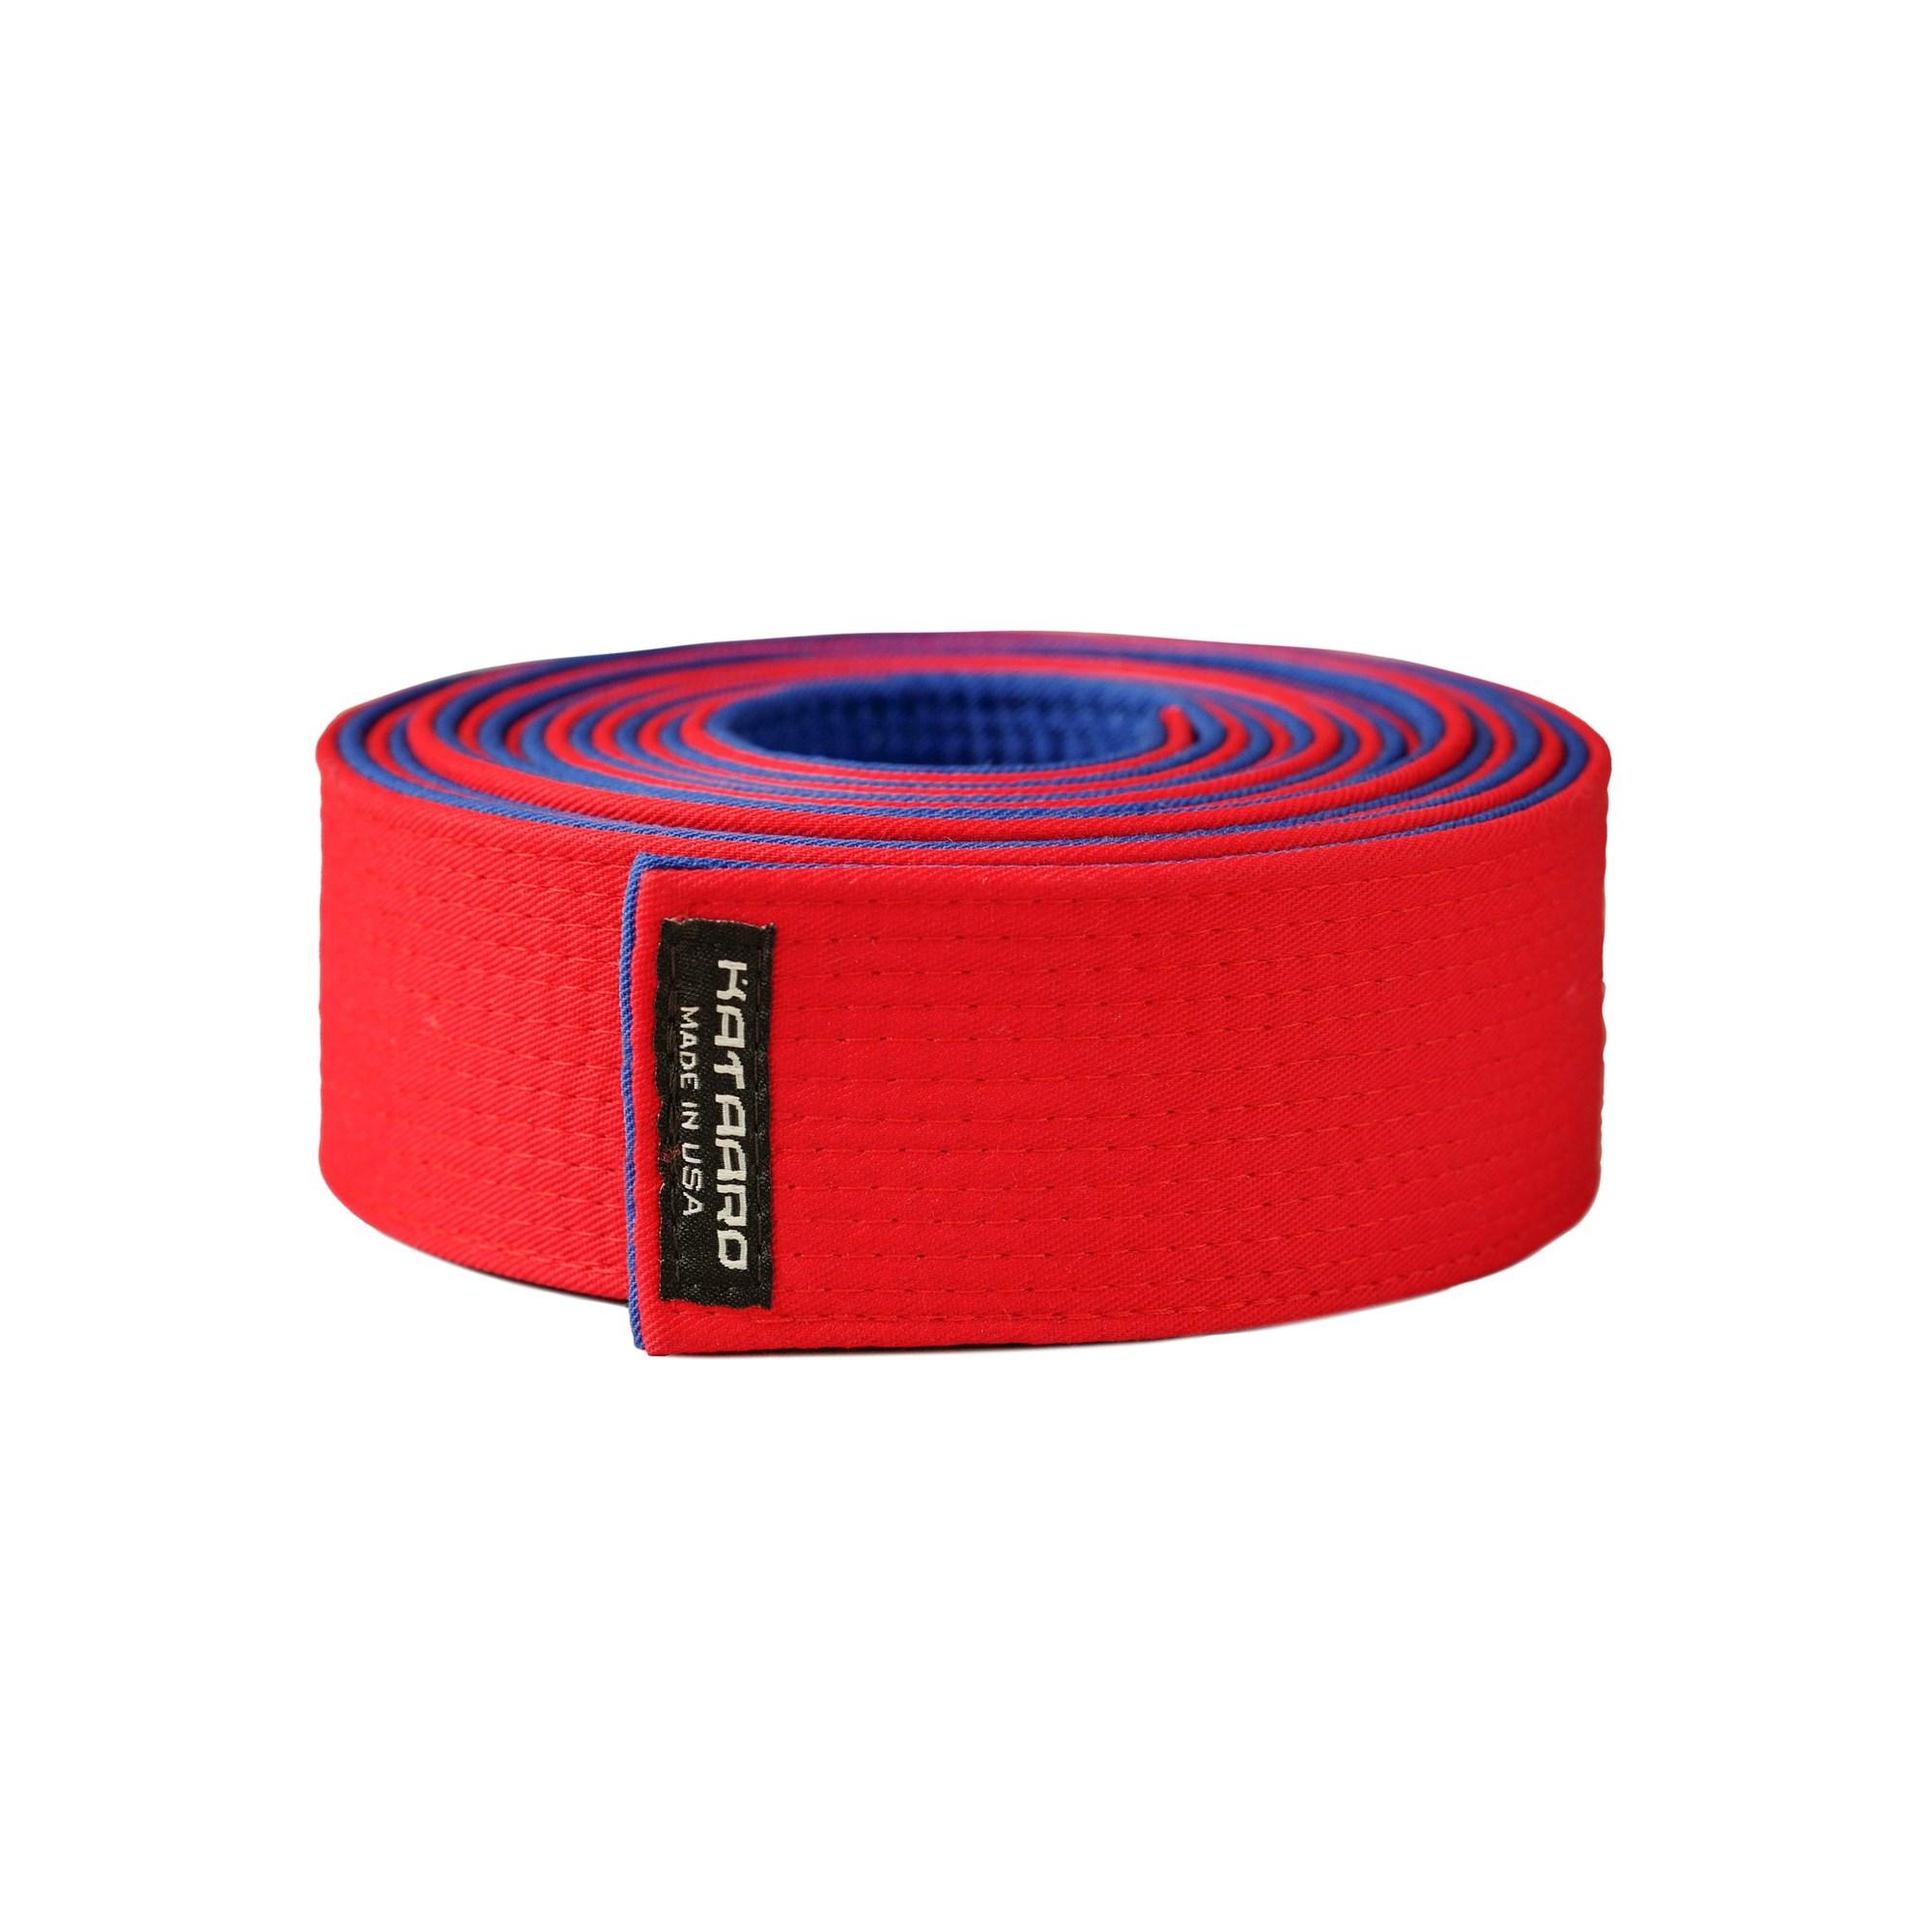 Custom Master Belt Karate Red Blue Kataaro